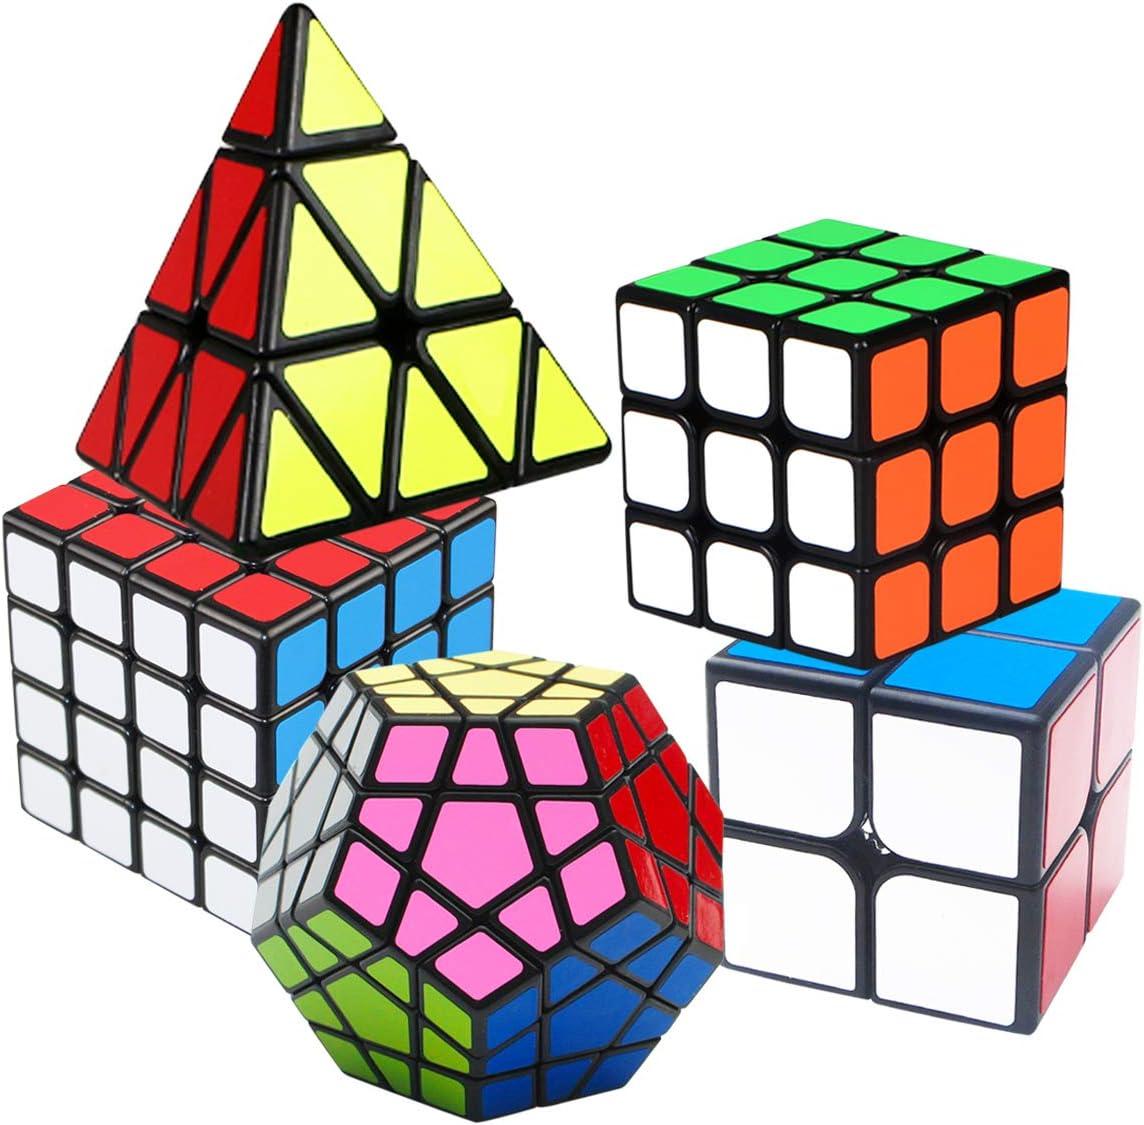 Zauberwürfel Speedcube Set, Puzzle Cube Set 2x2 3x3 4x4 5 Stück (5 Stück)